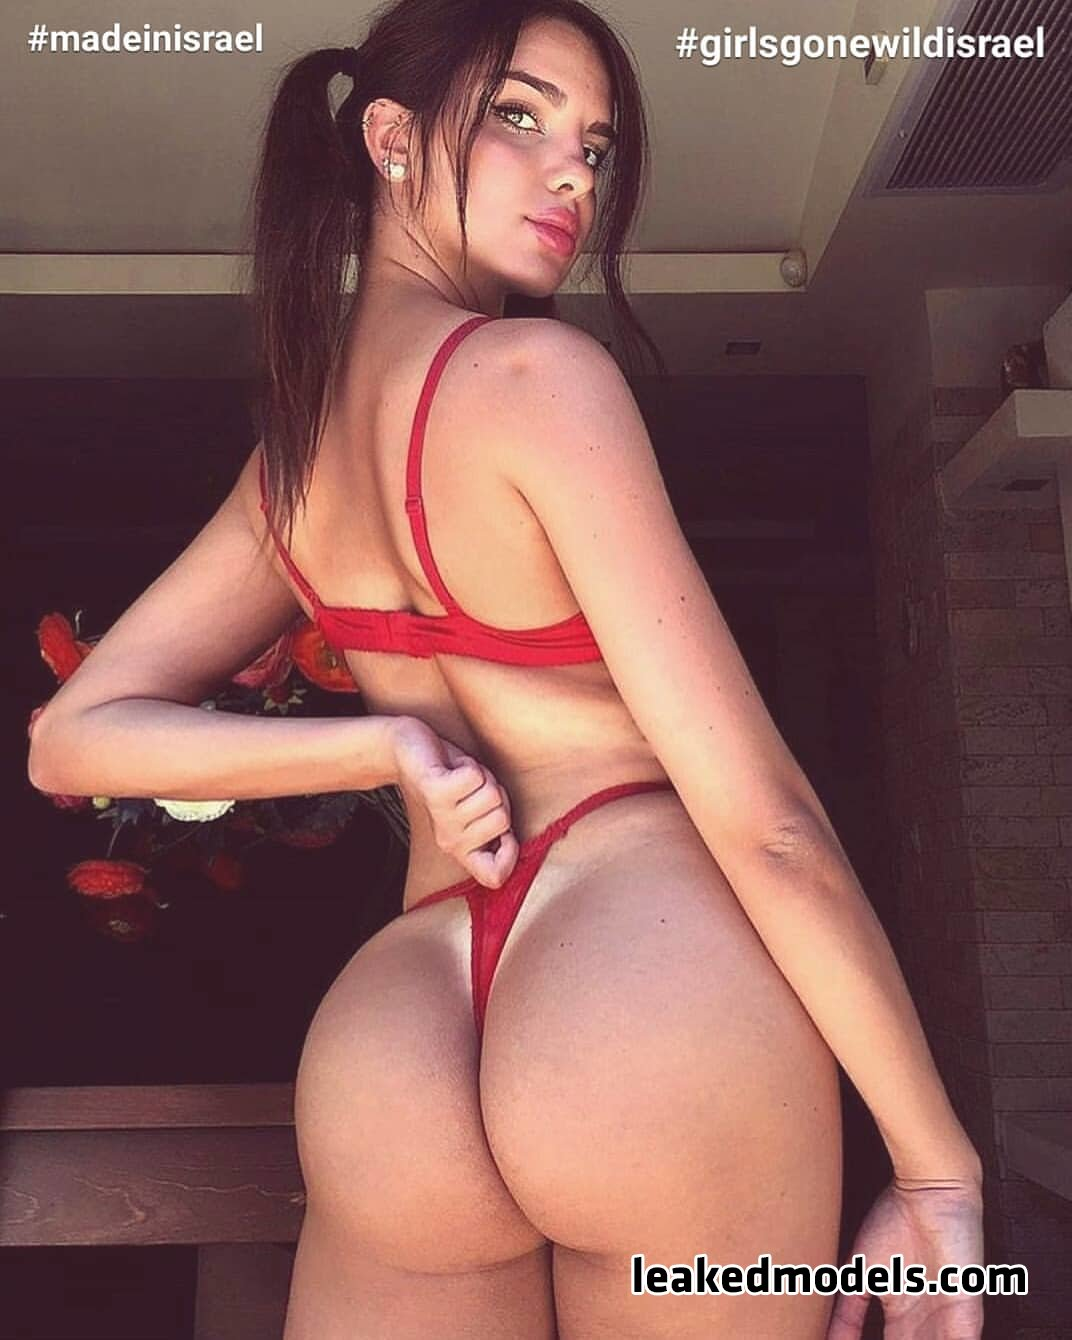 Ilana Kostrova – Ilanosh Instagram Nude Leaks (37 Photos)